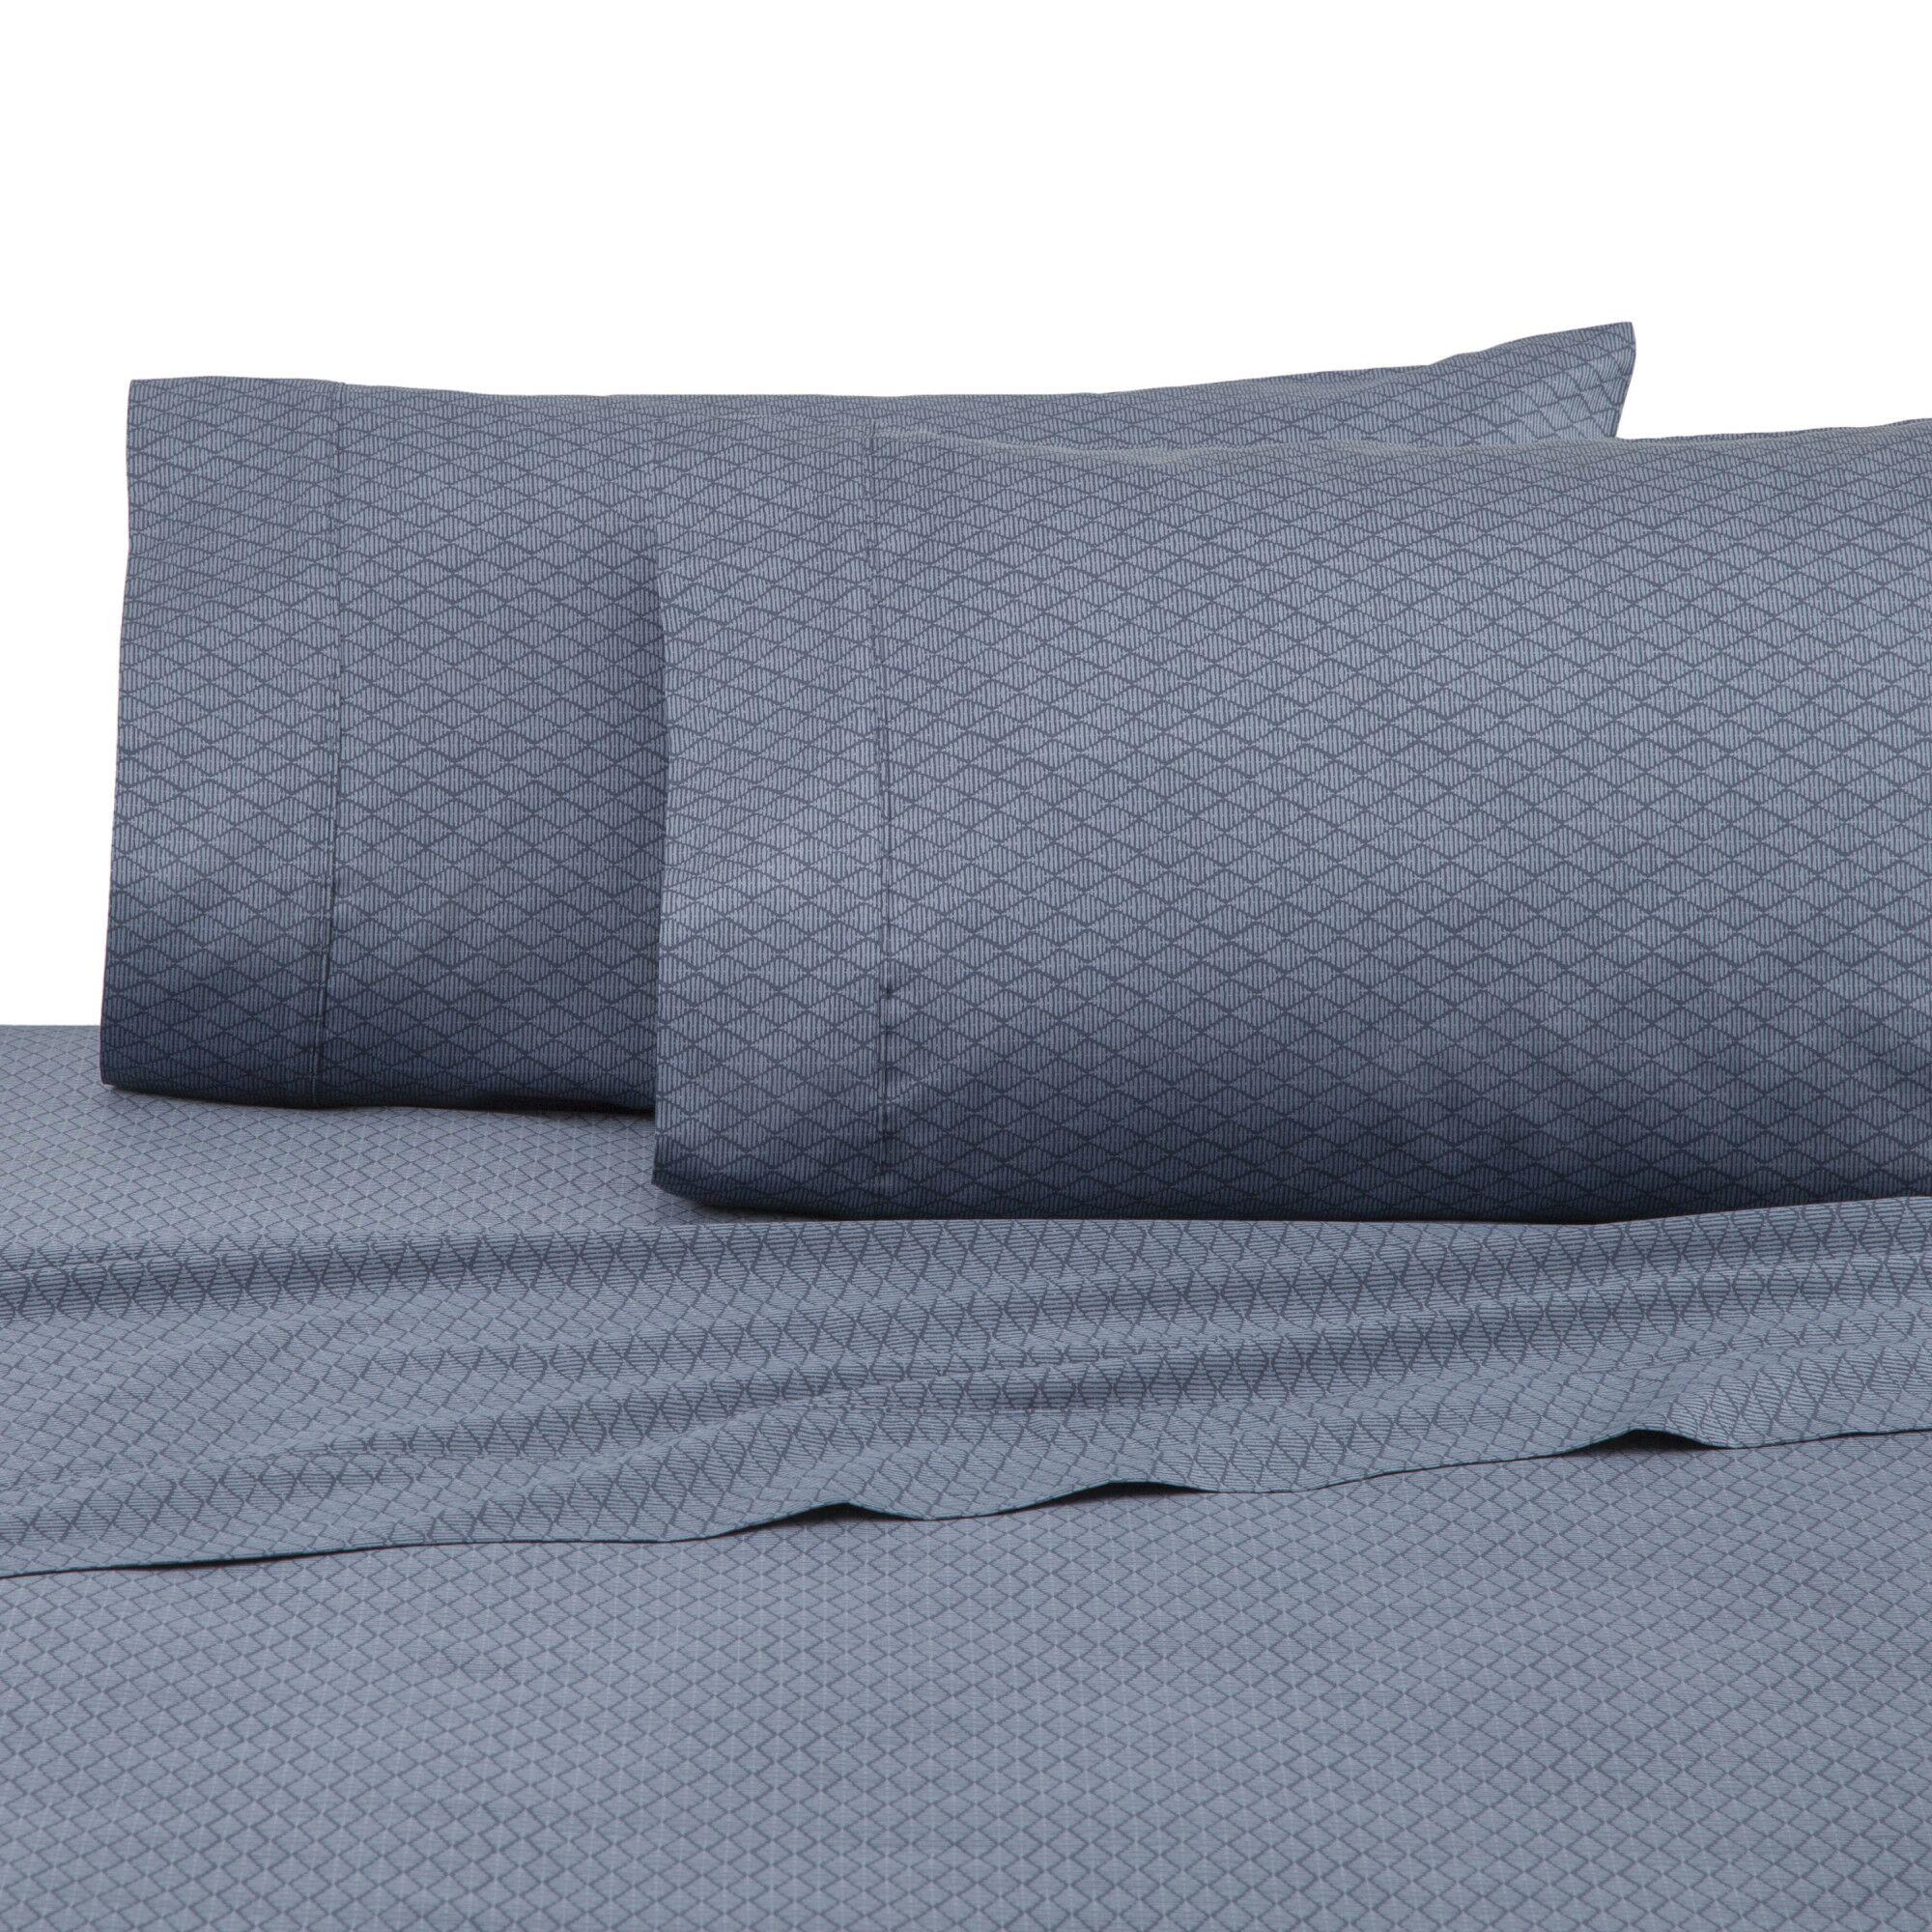 400 Thread Count 100% Cotton Sheet Set Color: Navy Diamond Lines, Size: Queen